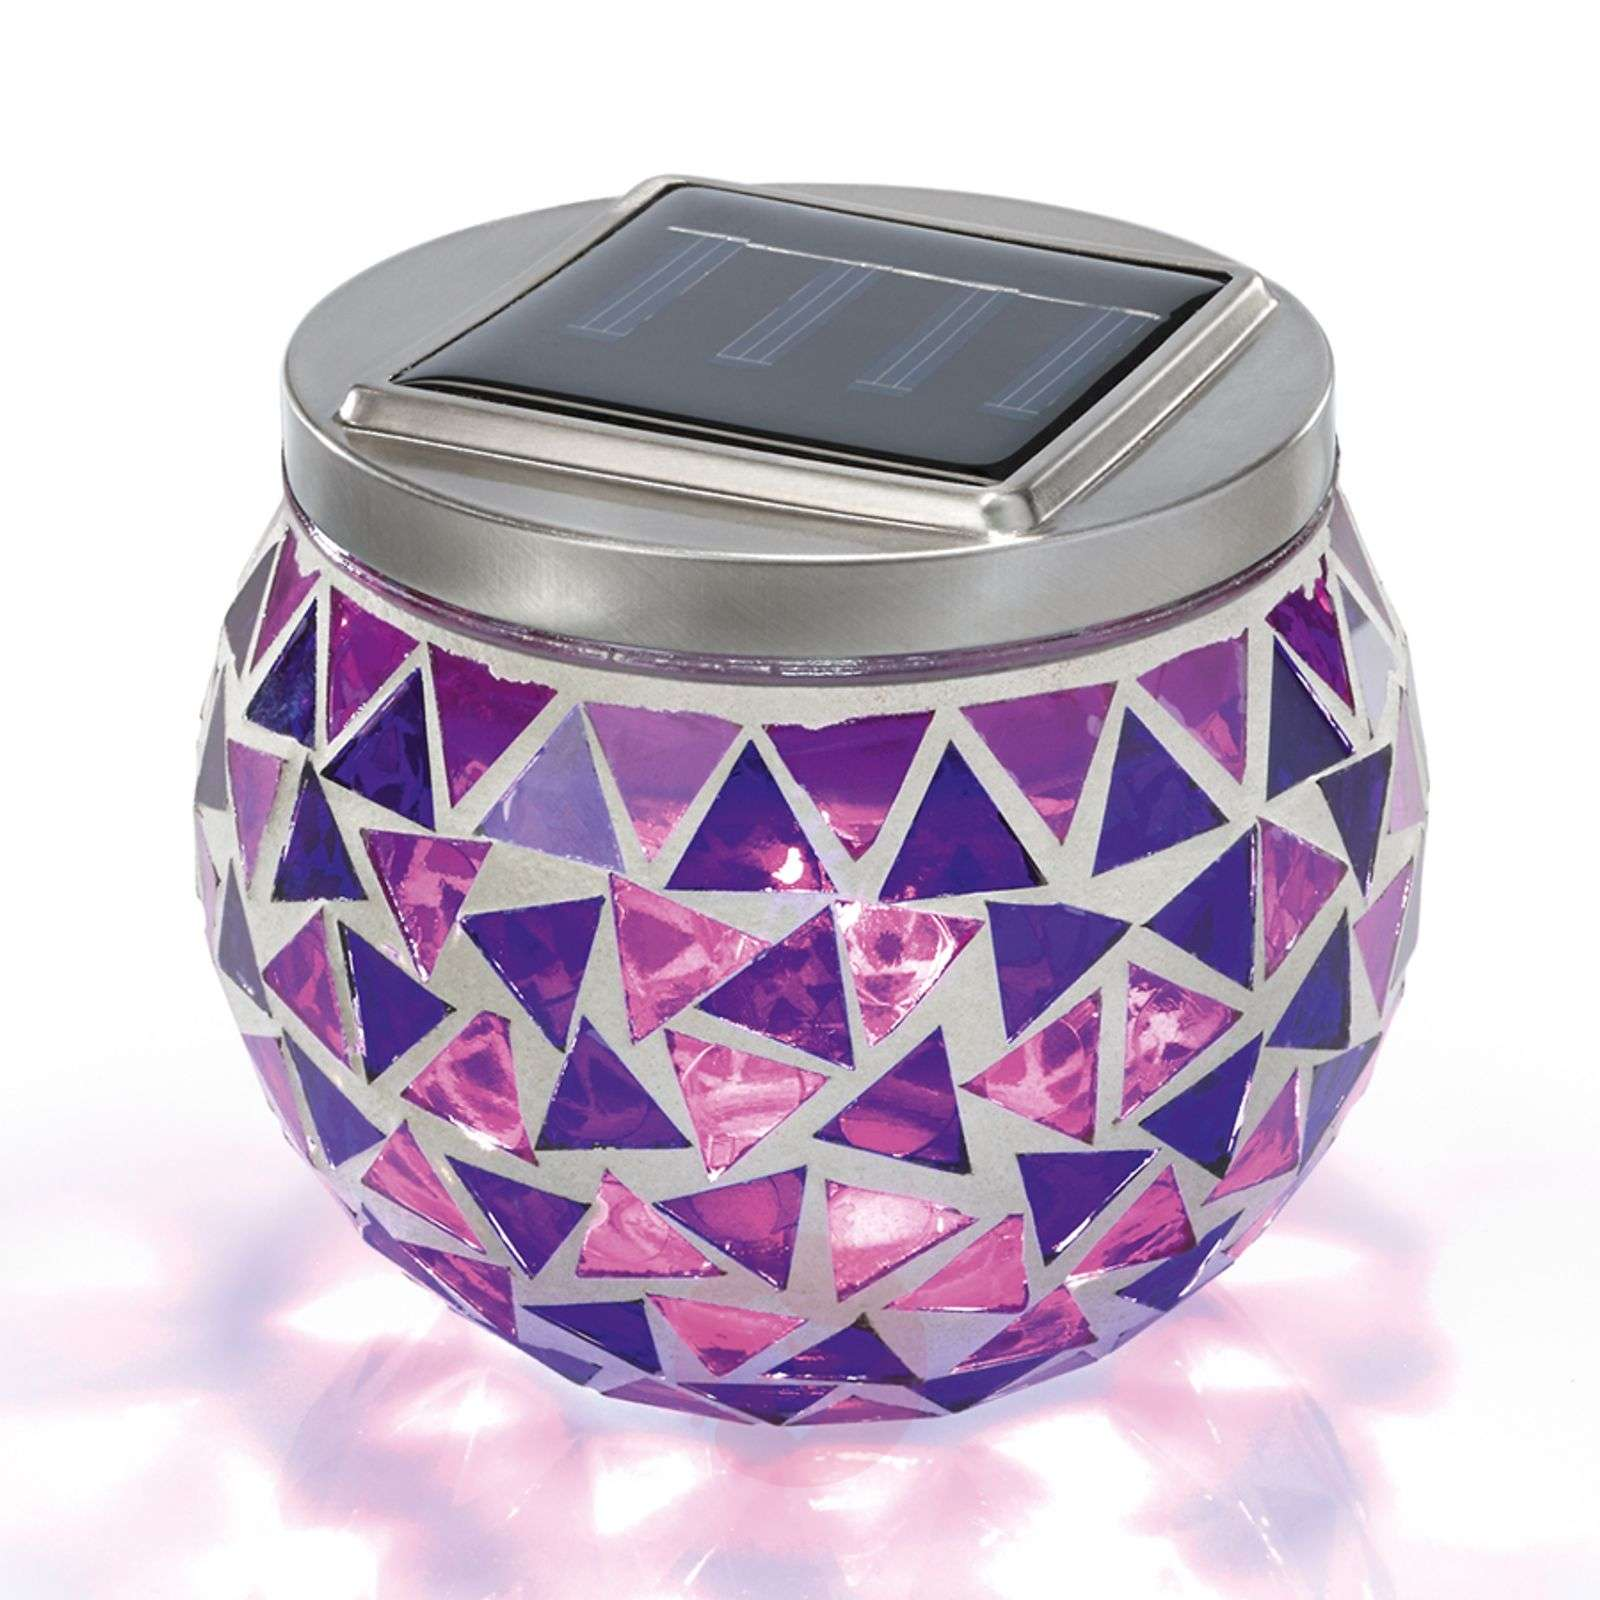 Solar mosaic light Hanna-3012218-01